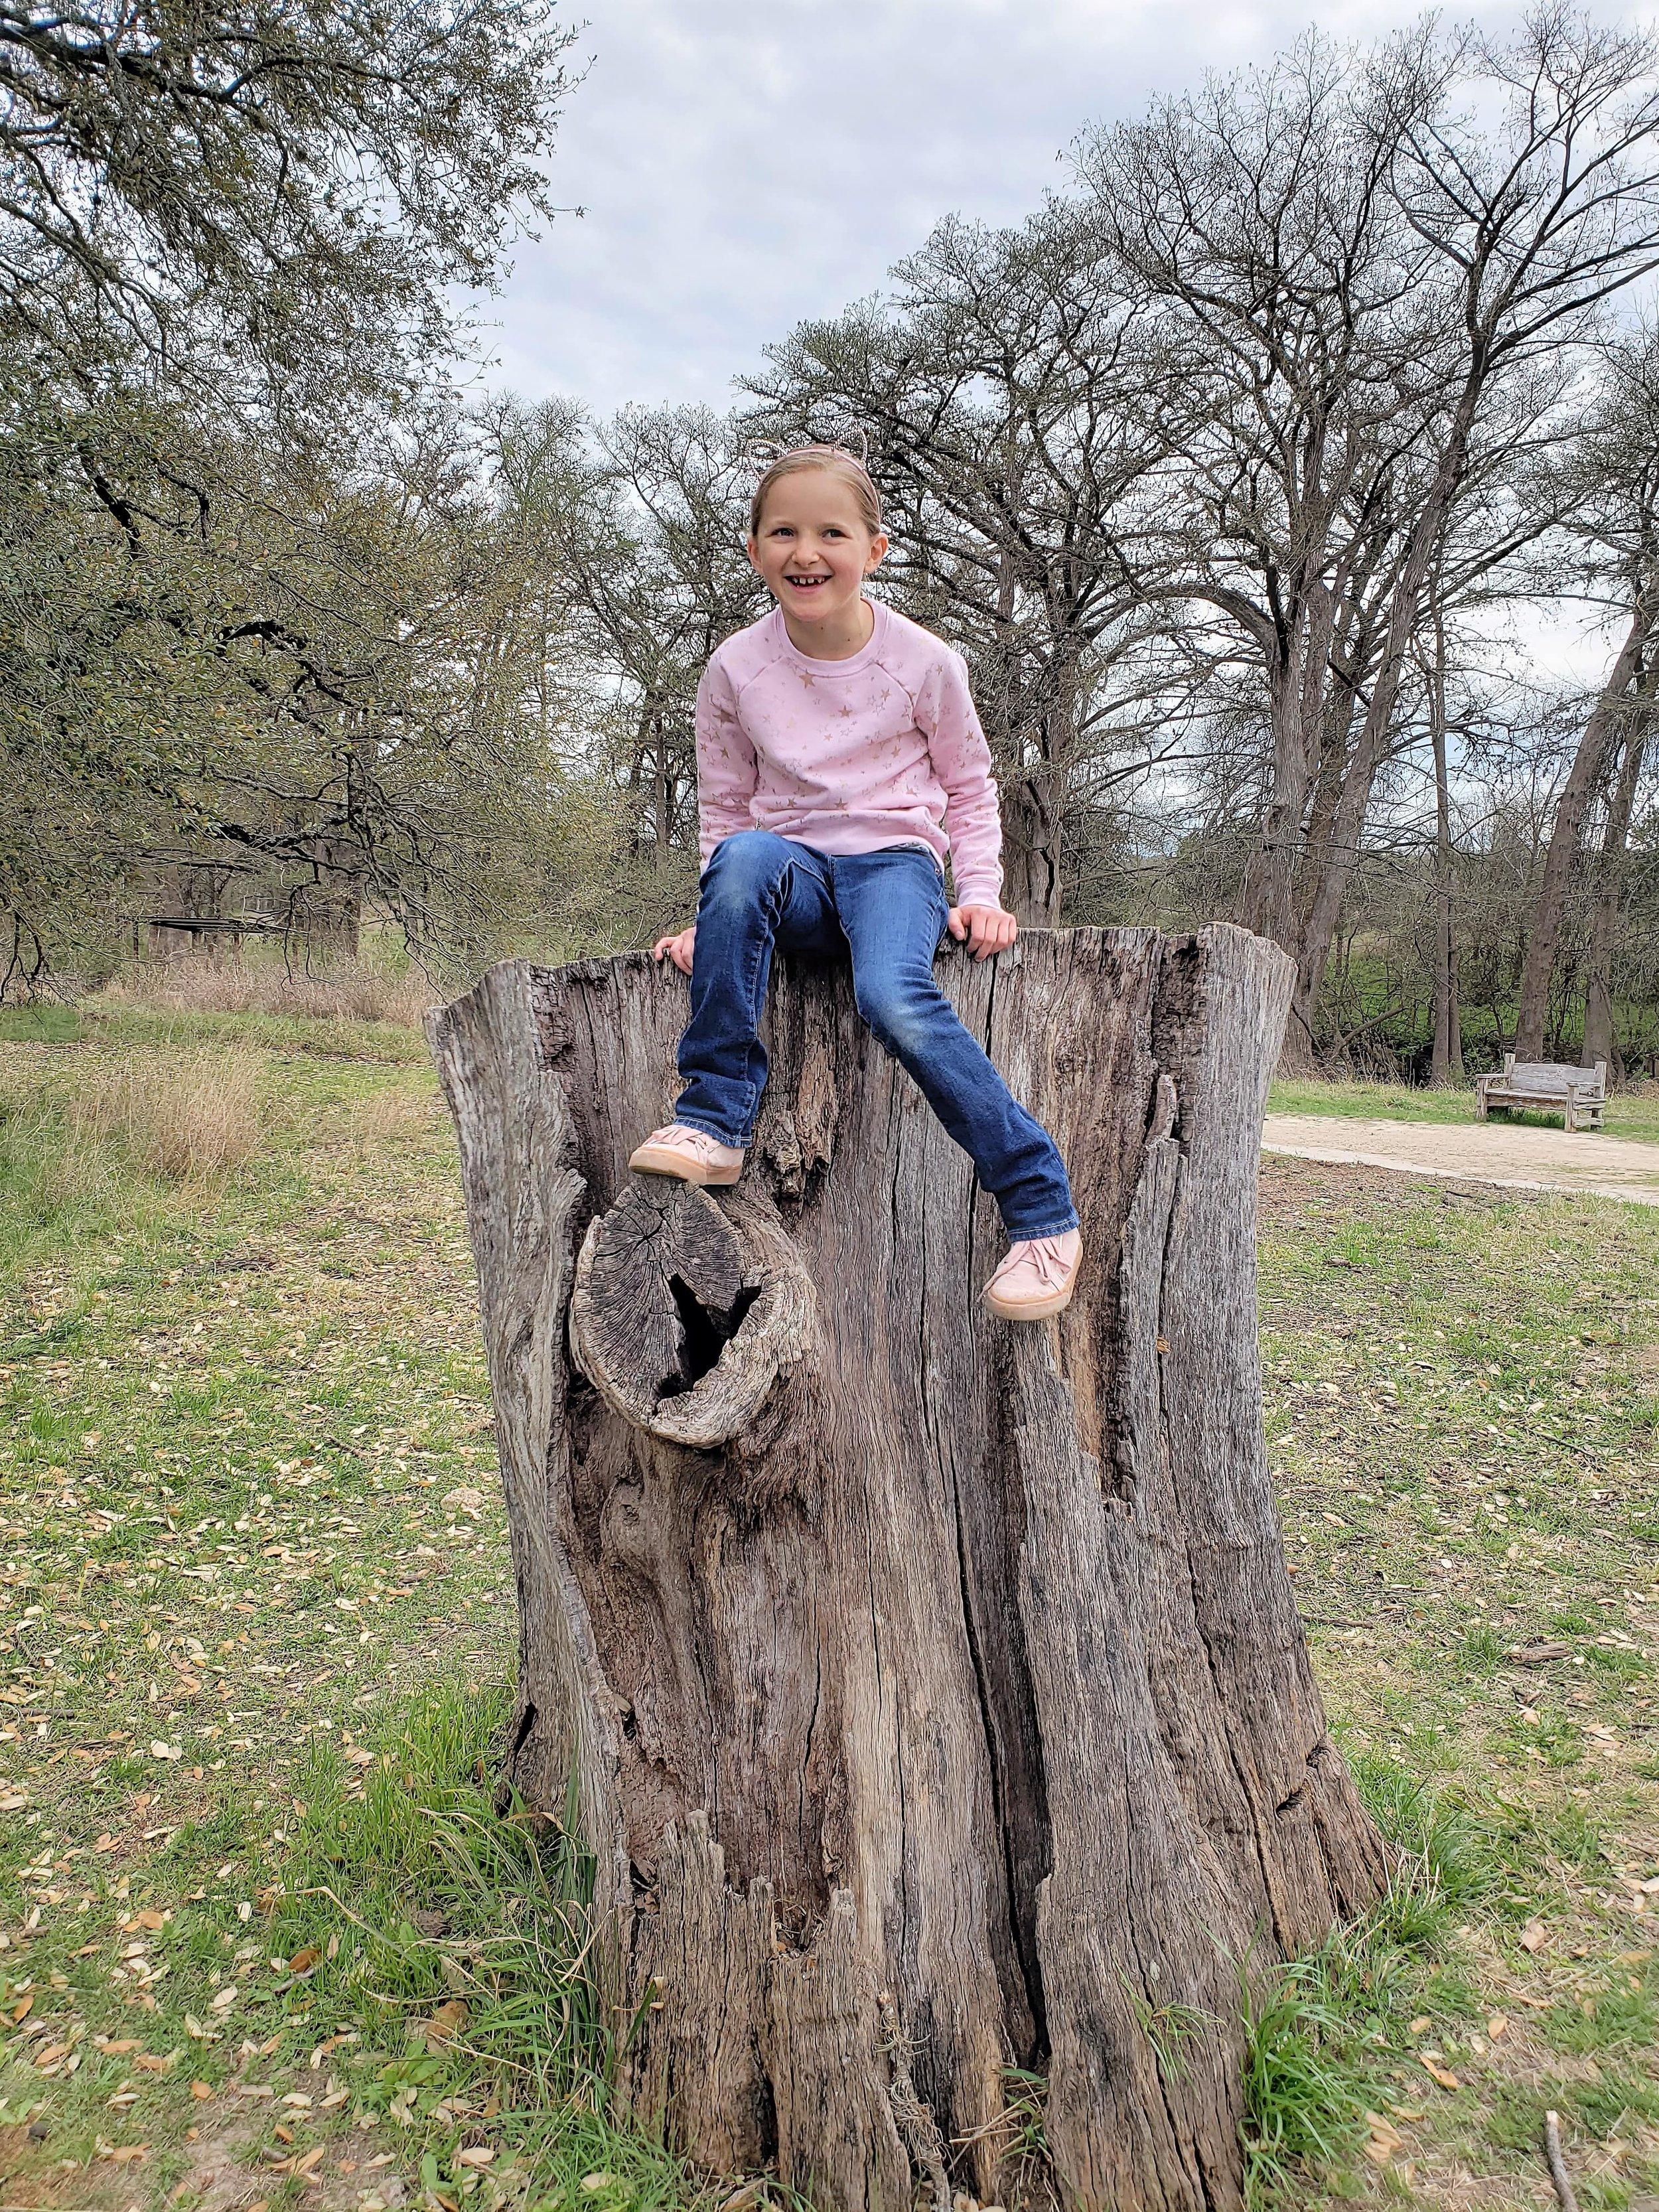 cibolo nature center boerne texas sowing seeds blog